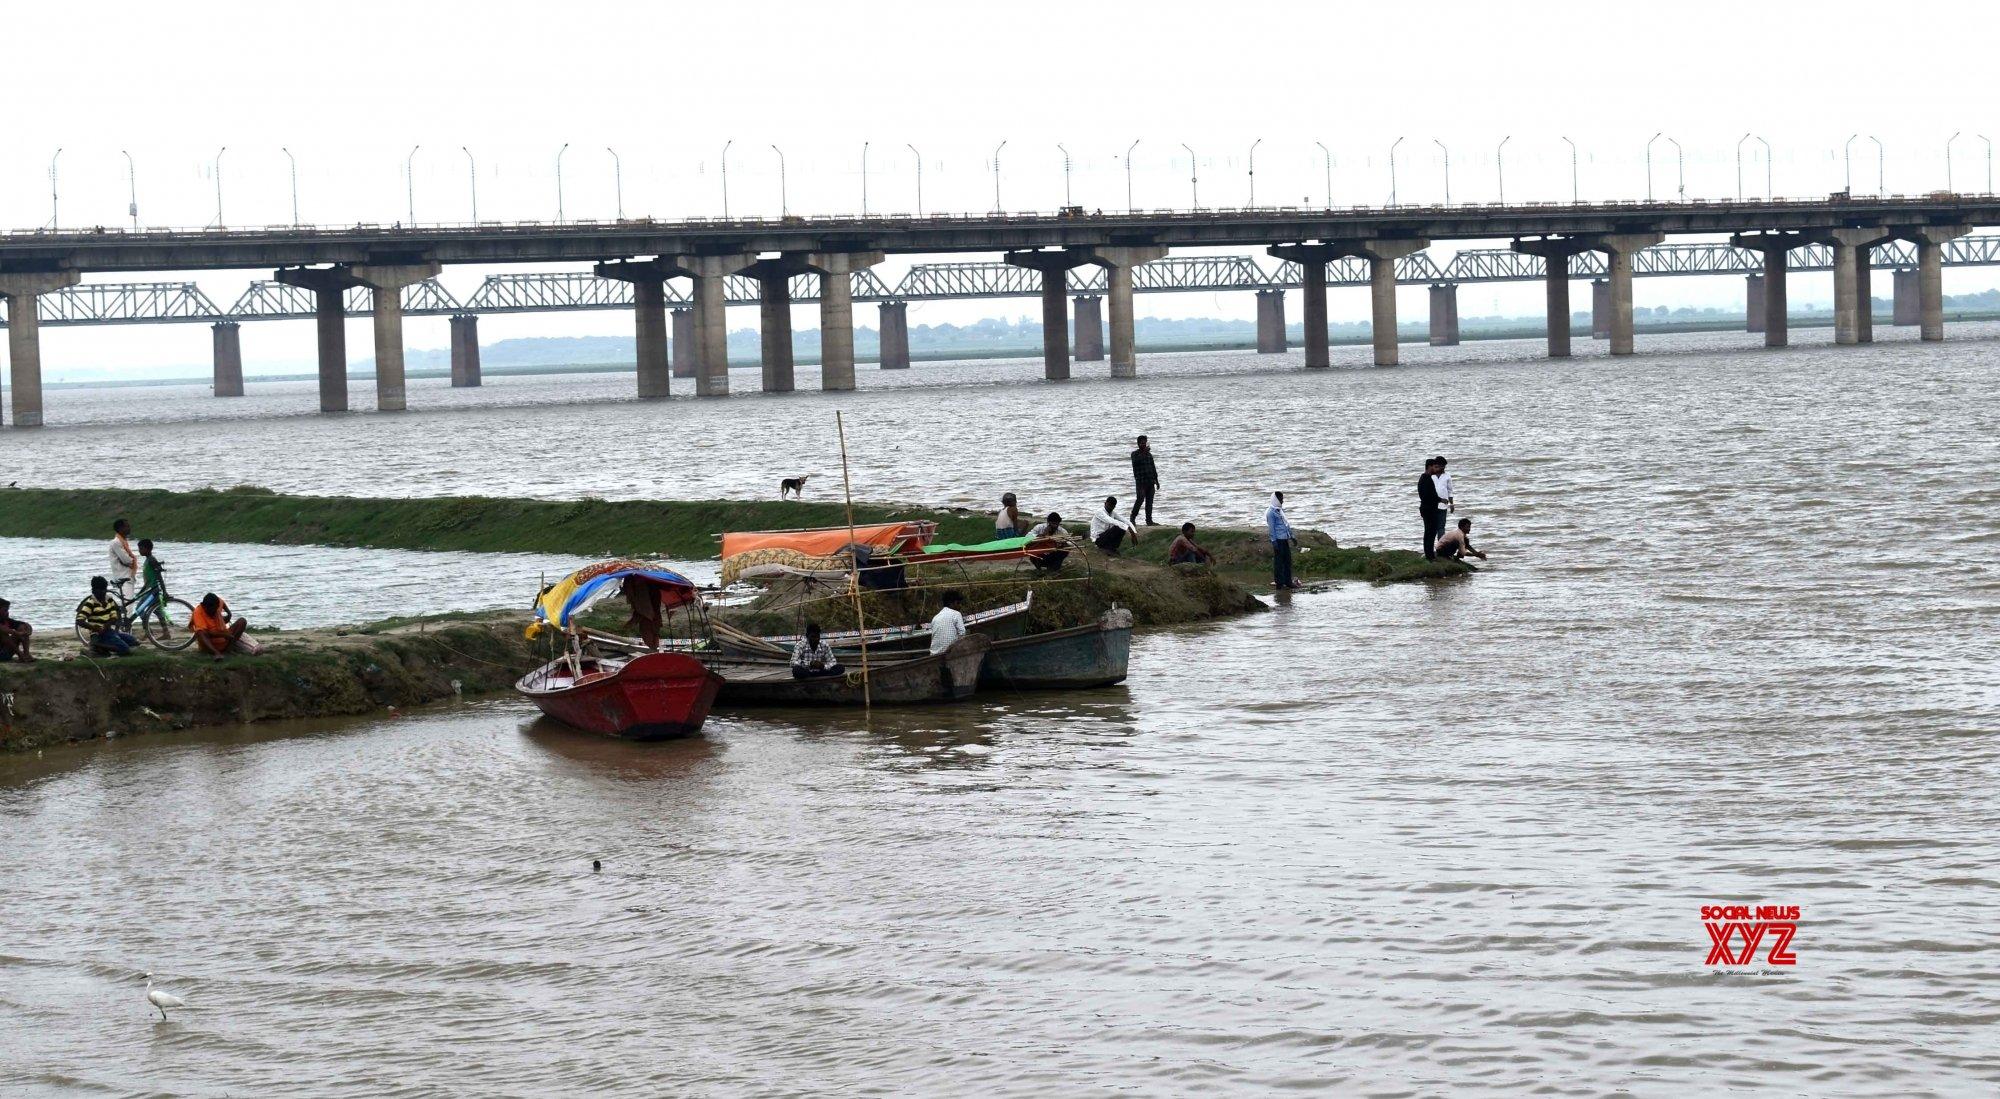 Prayagraj: River Ganga continues to swell following heavy rains #Gallery